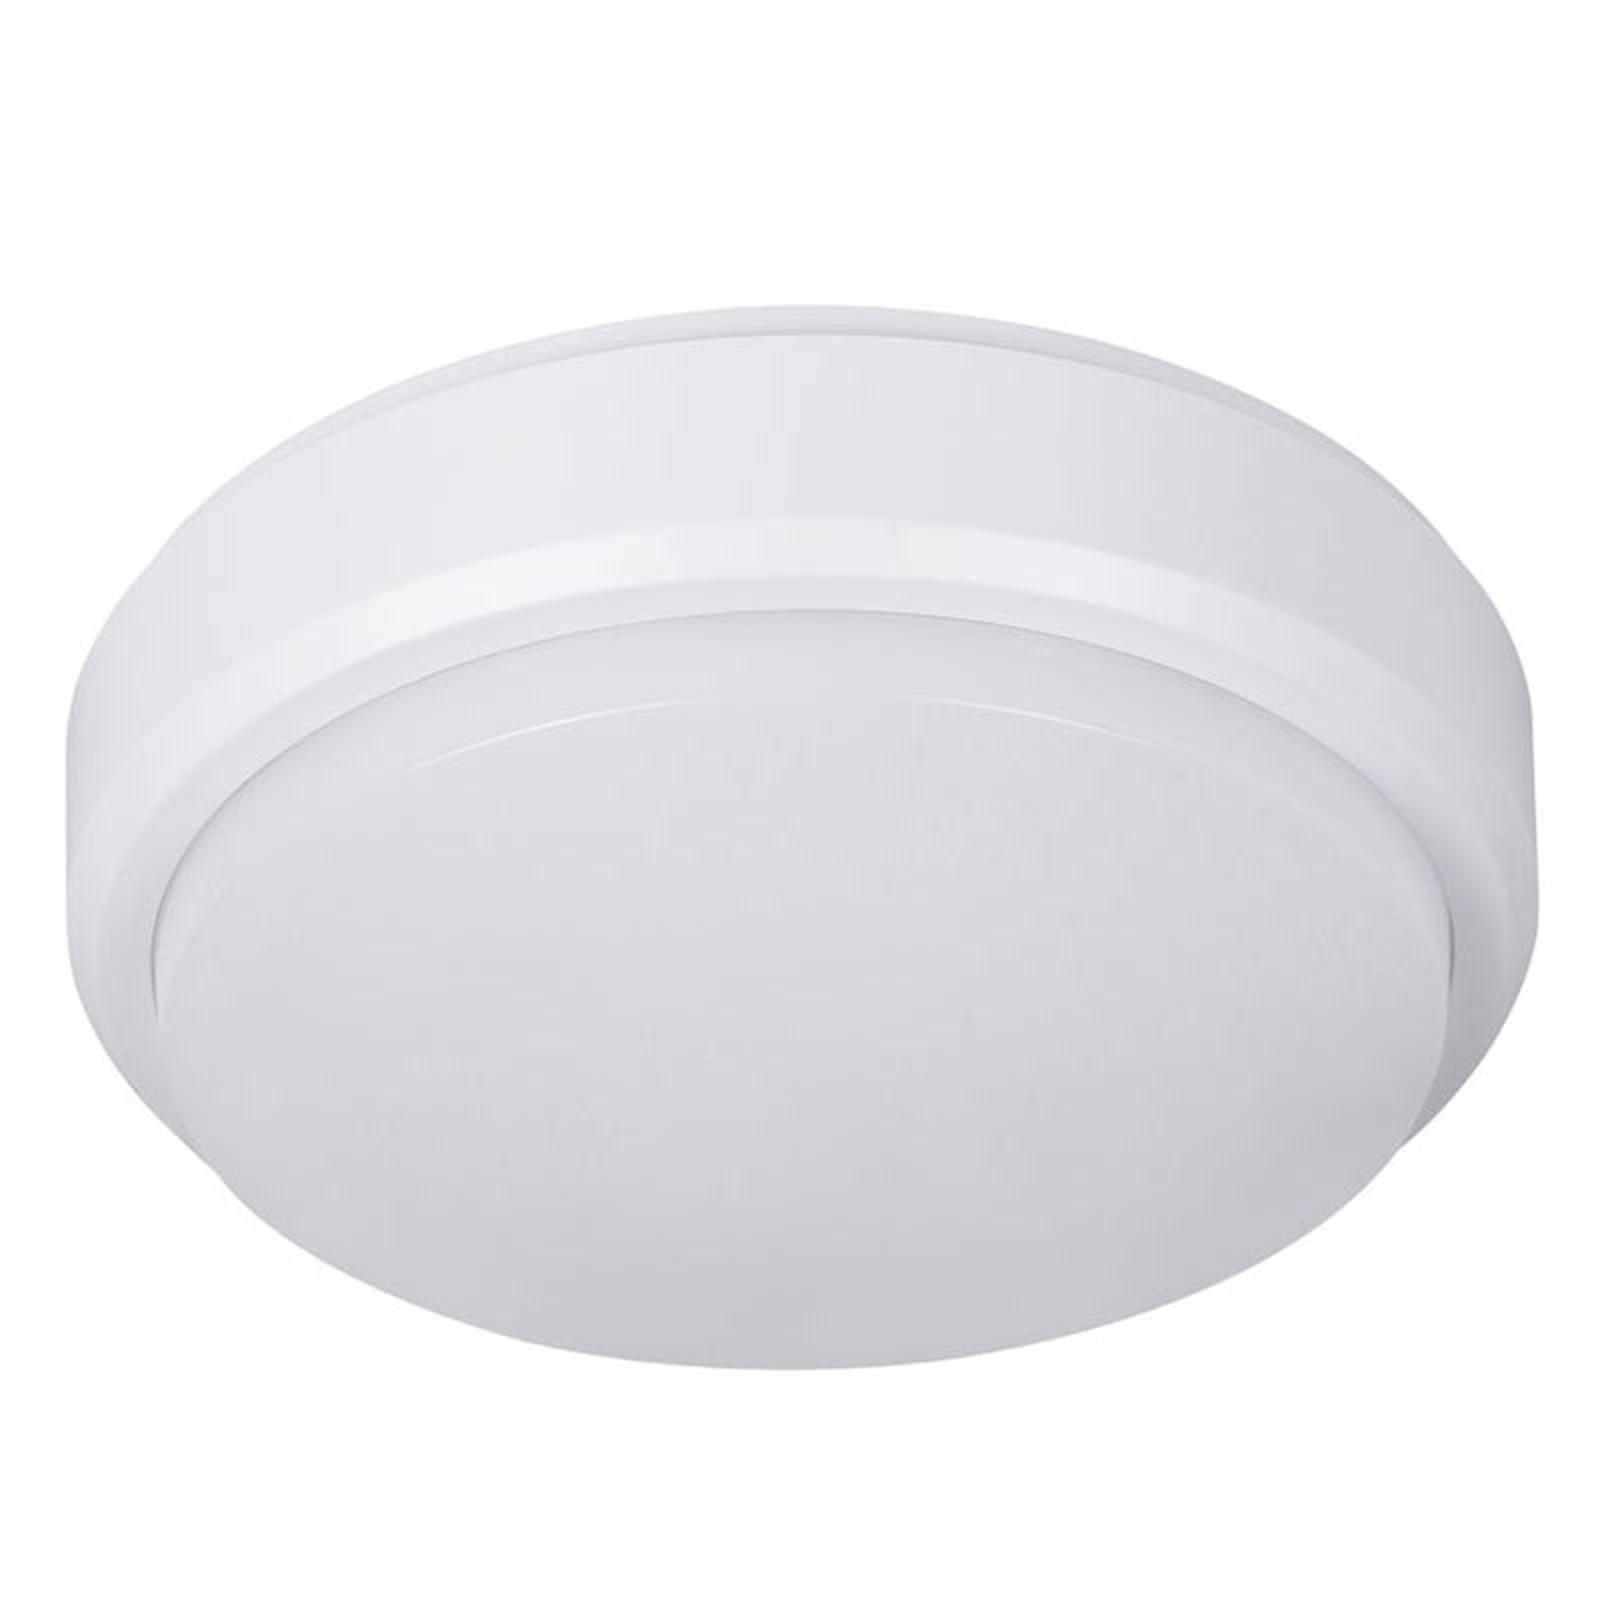 Runde LED-Deckenlampe Bulkhead mit IP54